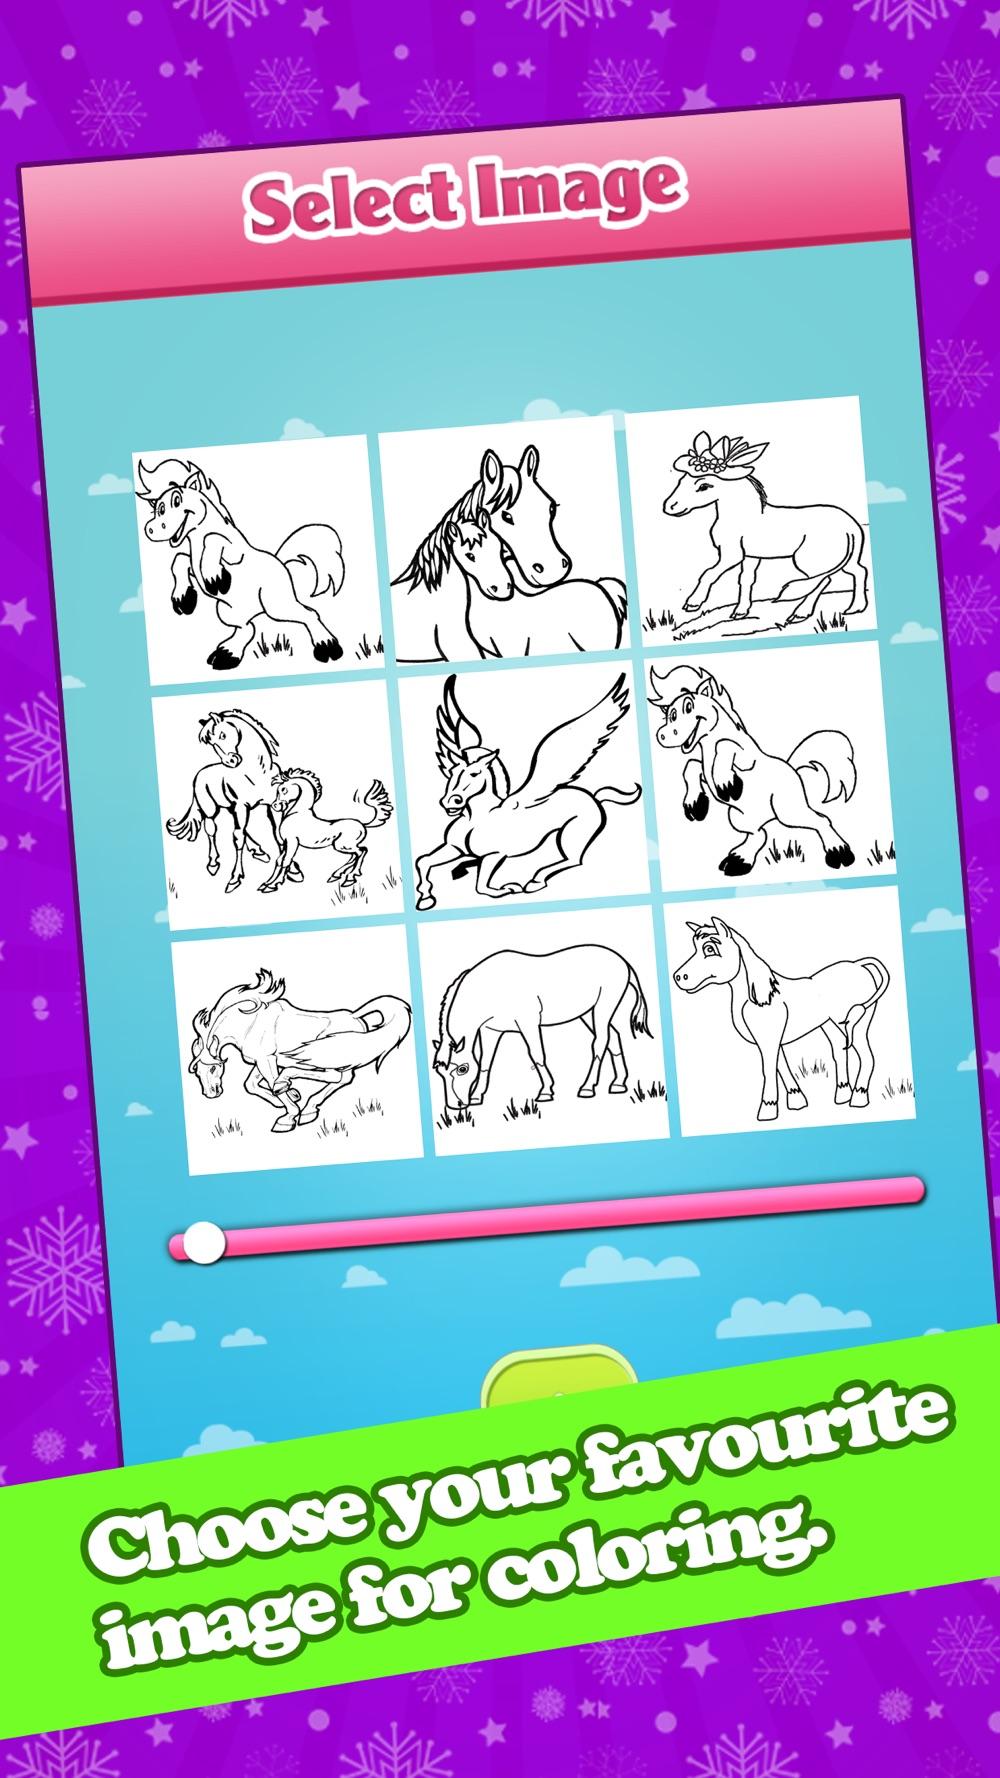 Horse Coloring-Interactive Colorfy Secret Editing hack tool